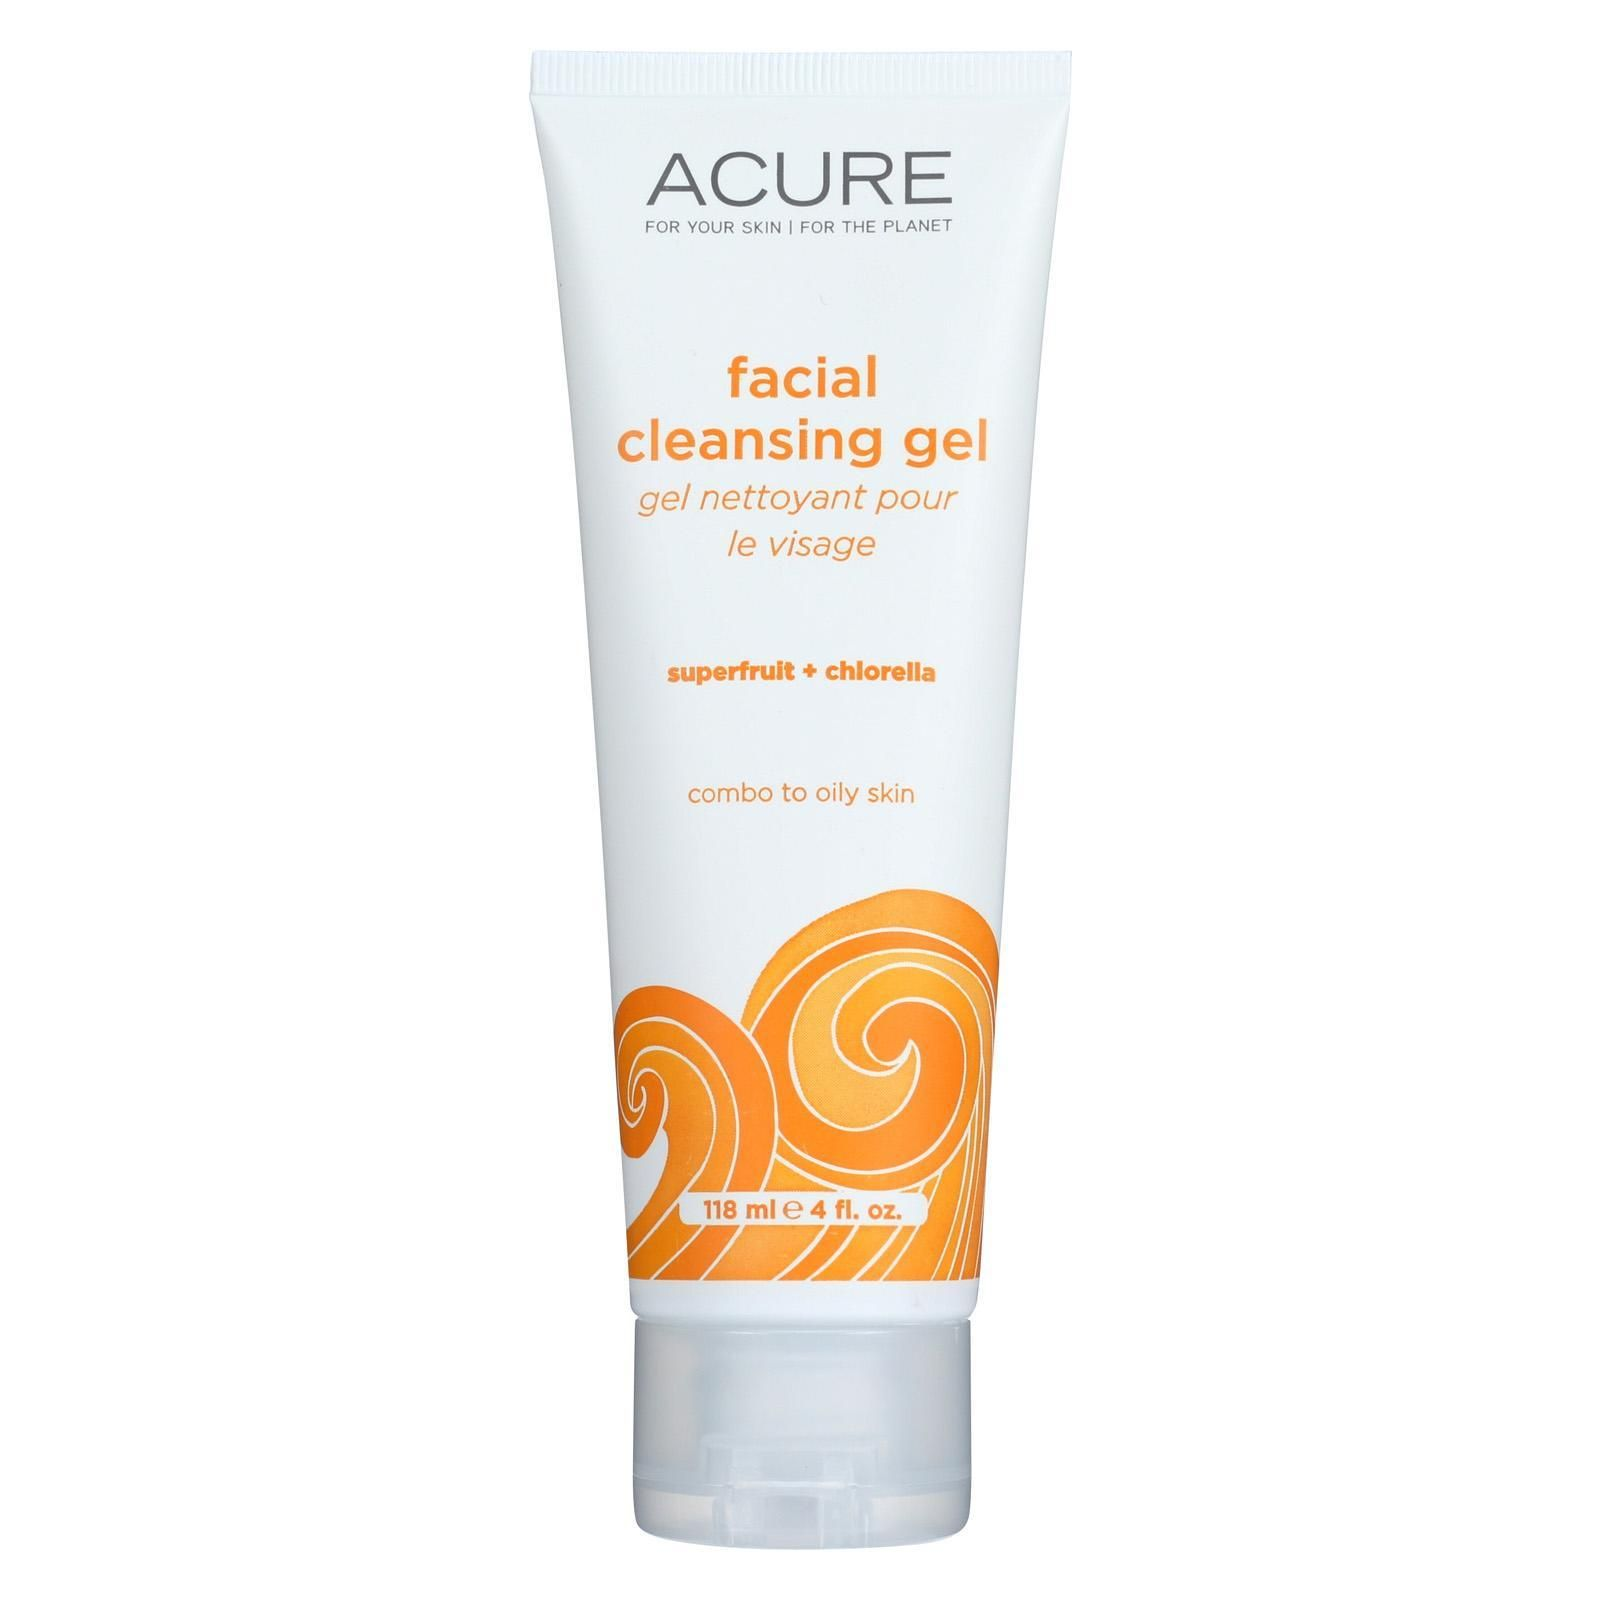 Acure Facial Cleansing Gel